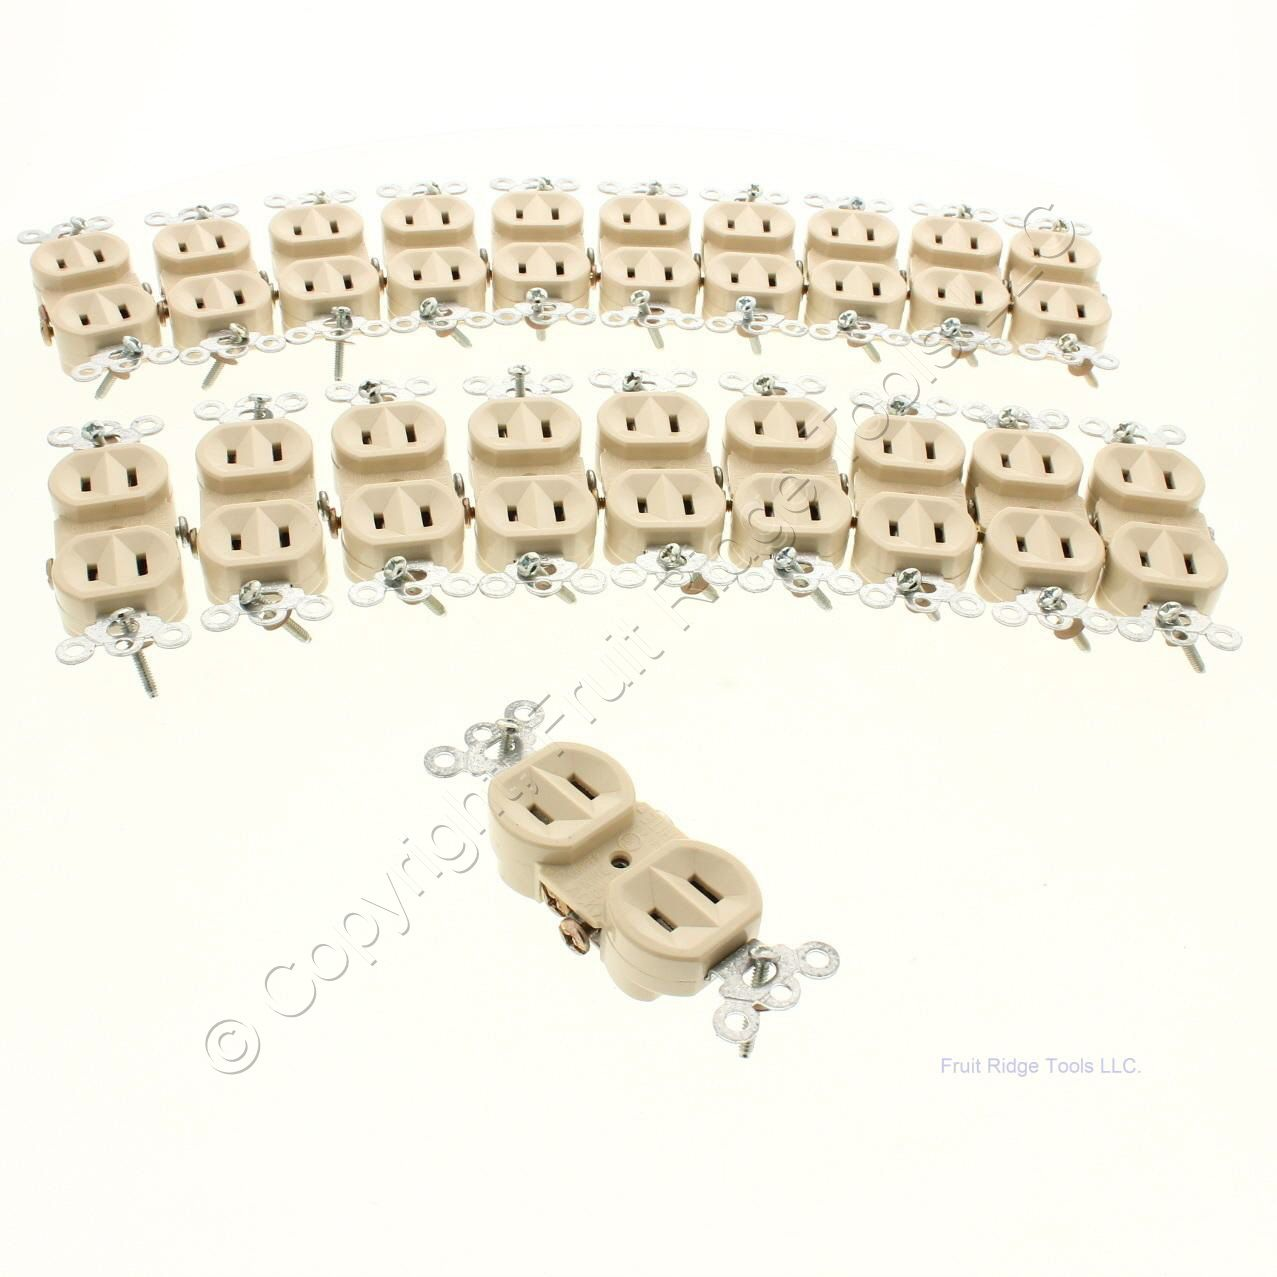 20 p s ivory duplex outlet receptacles non grounded nema 1 15r 15a 125v 4025 i ebay